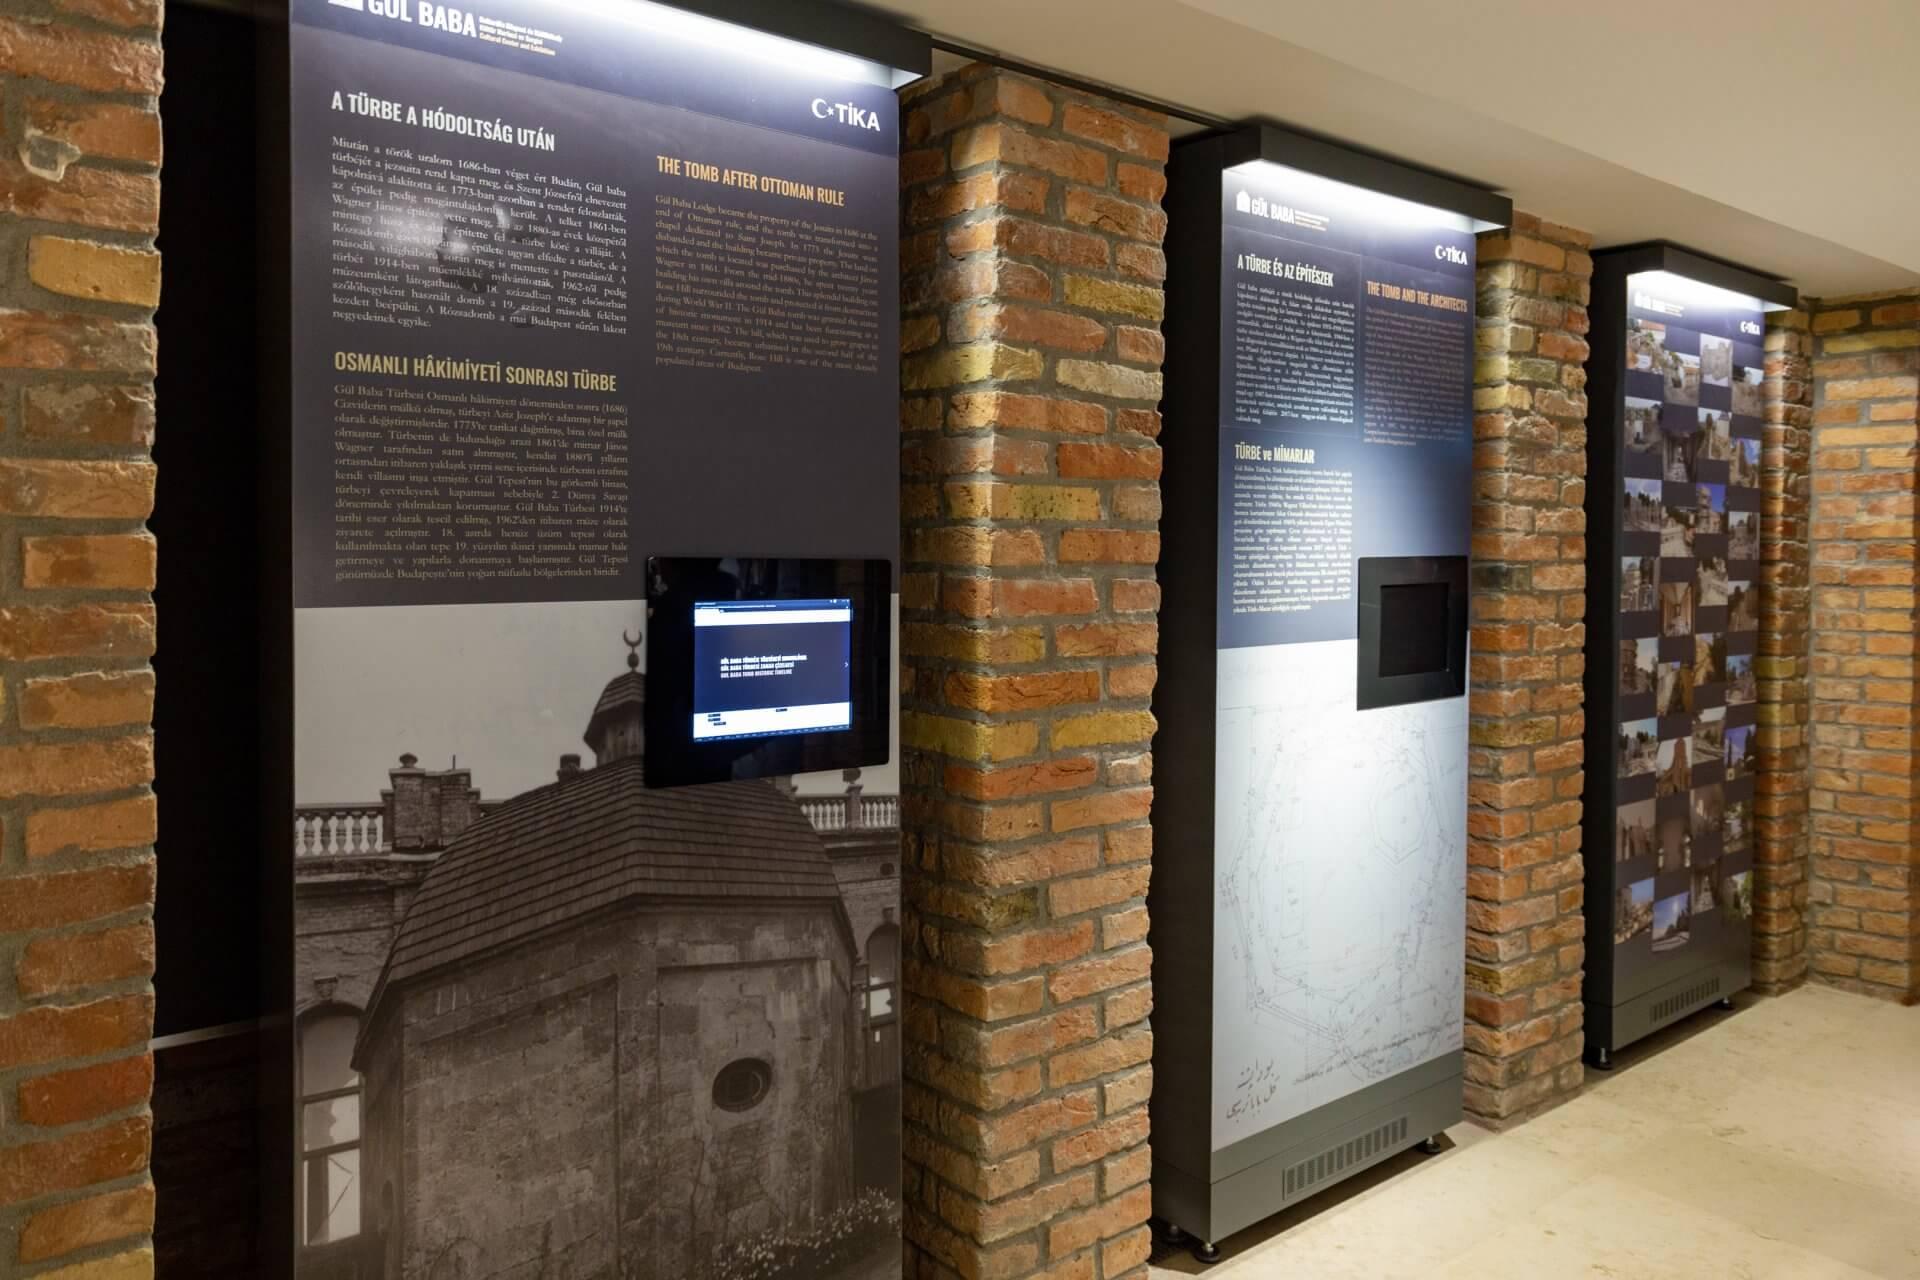 Ausstellung im Kulturzentrum Gül Baba